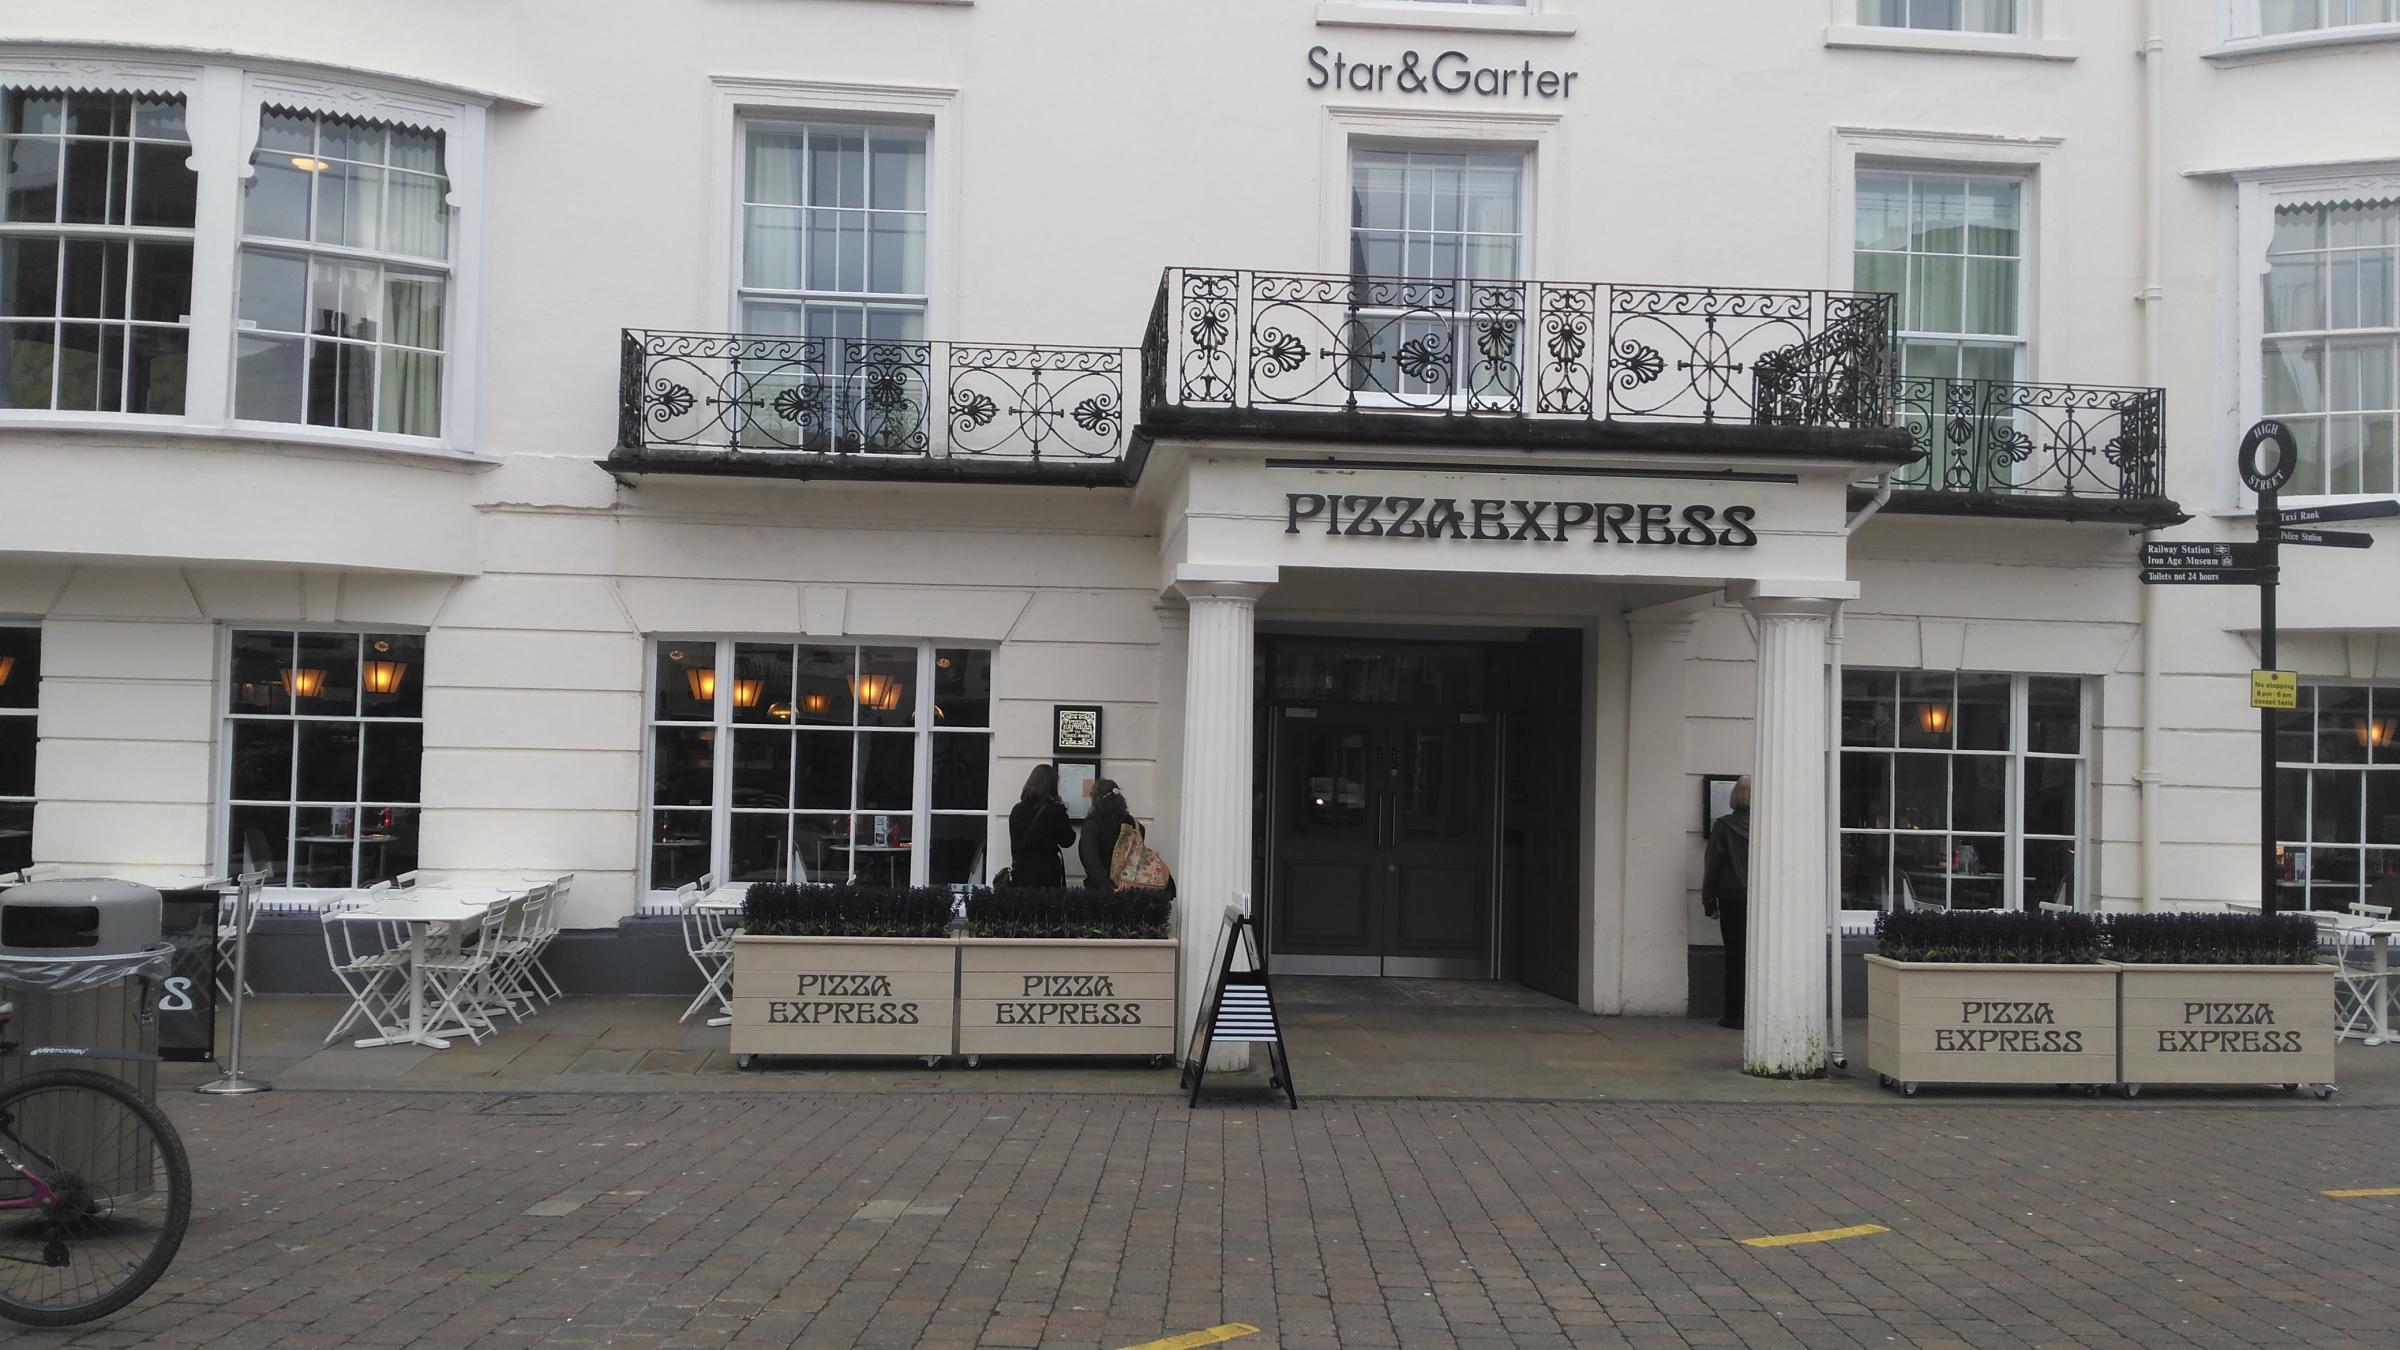 New Pizza Express In Ground Floor Of Star Garter Hotel